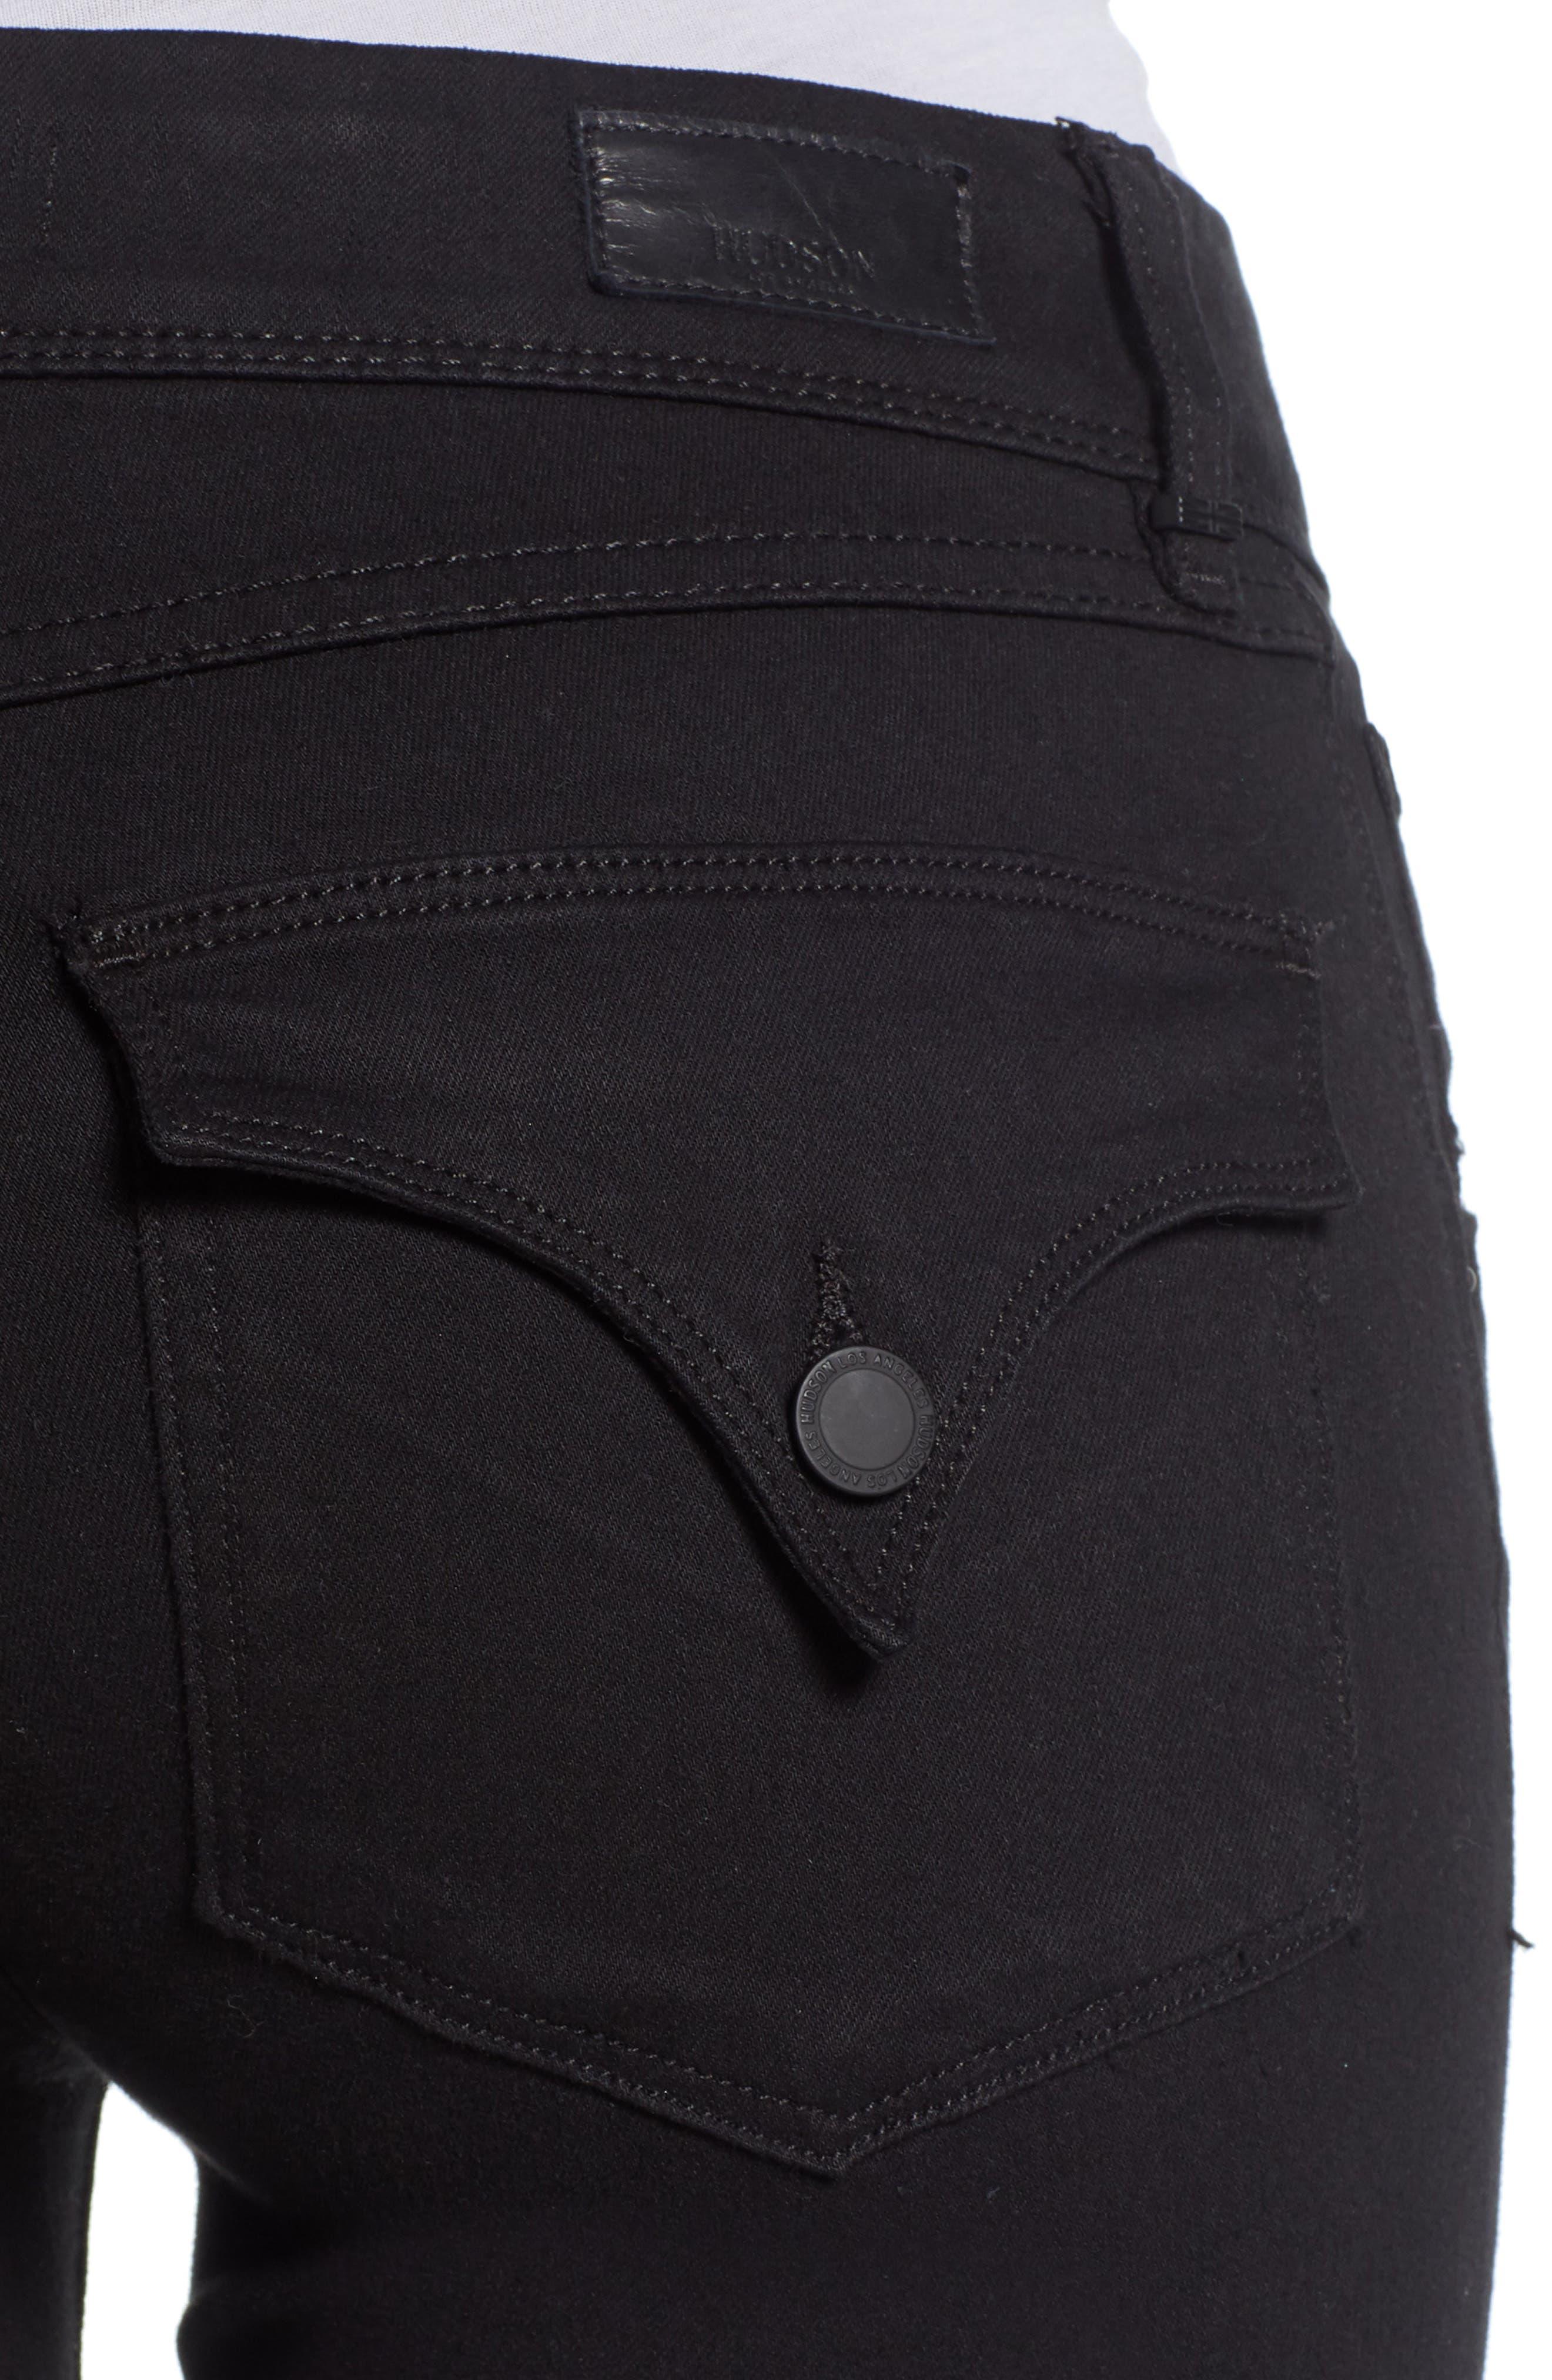 Collin Skinny Jeans,                             Alternate thumbnail 4, color,                             BLACK